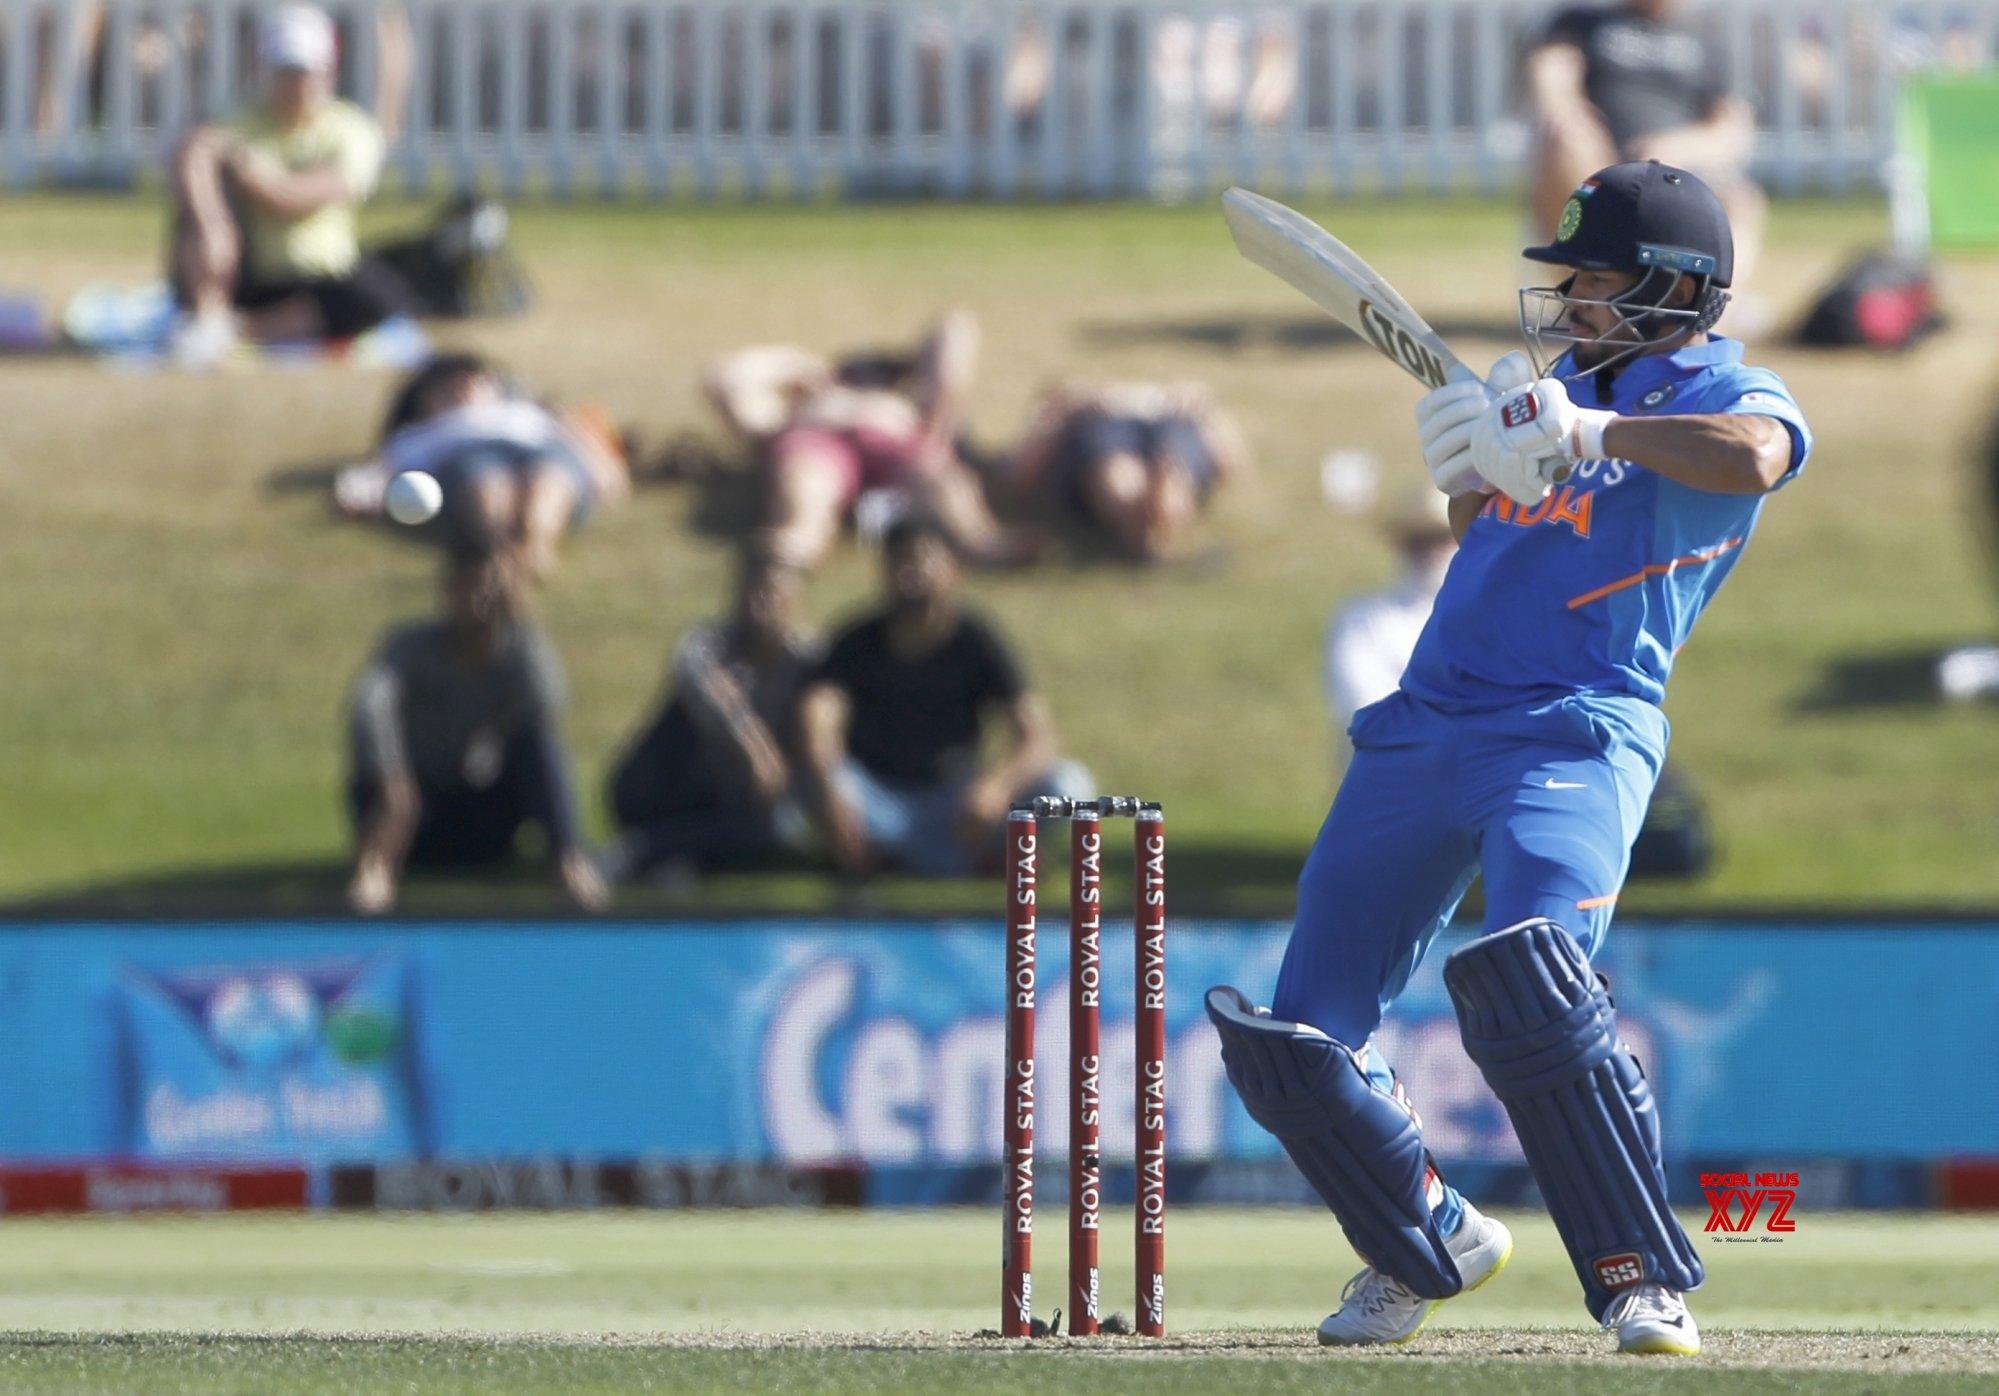 Mount Maunganui: 3rd ODI - India Vs New Zealand (Batch - 5) #Gallery